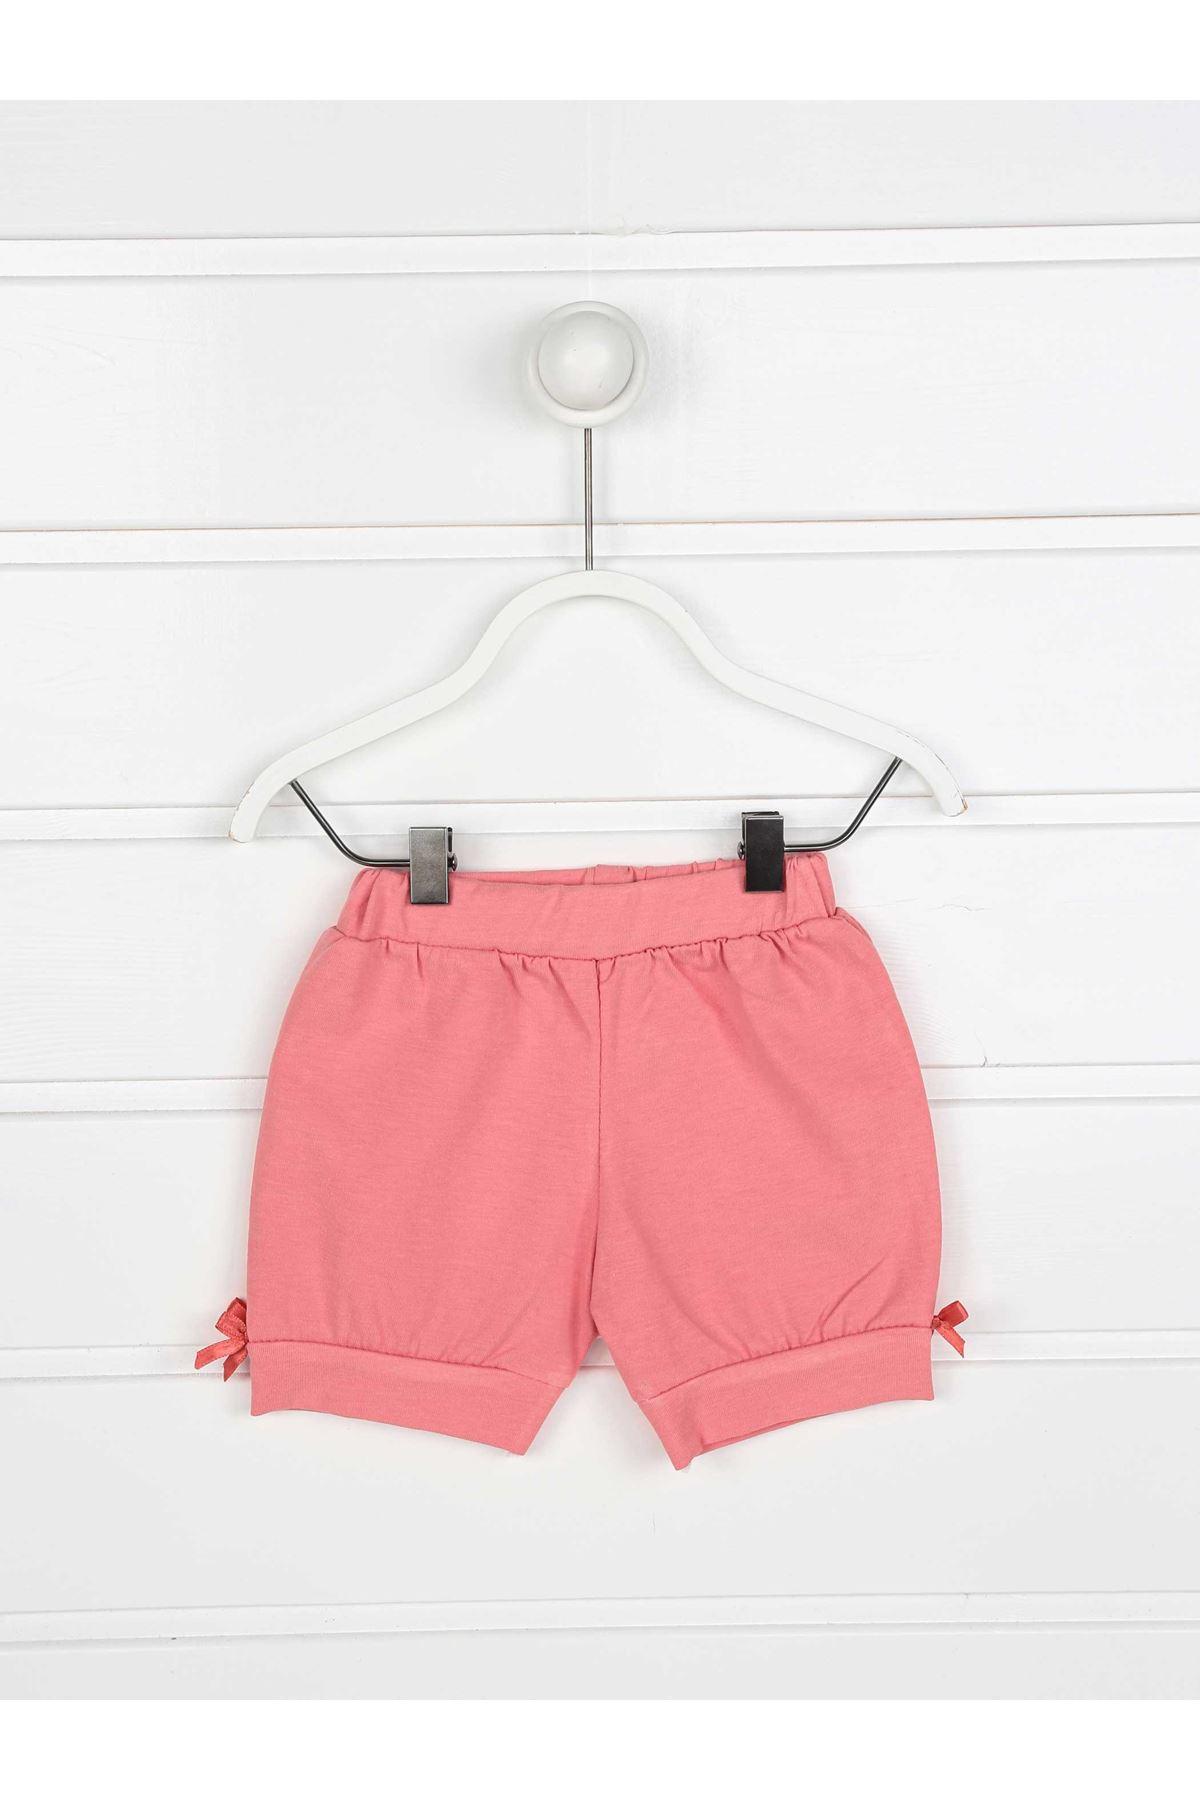 Summer baby girl bottom set short t-shirt 2 pieces bottom top babies cotton seasonal models